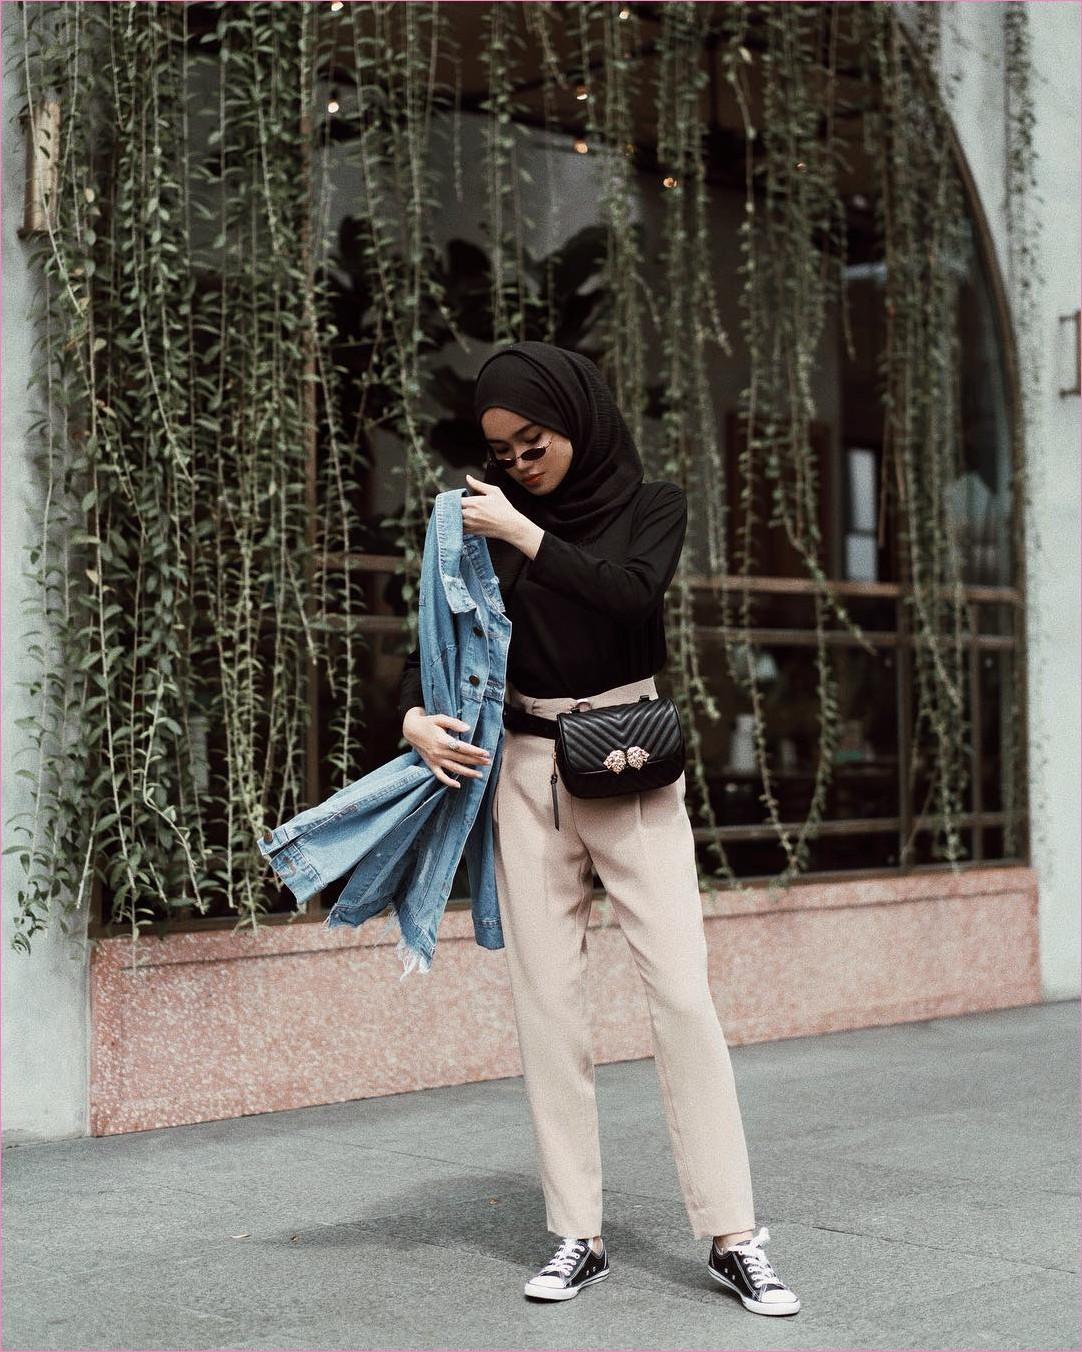 Outfit Untuk Remaja Berhijab Yang Mempunyai Tubuh Pendek Tapi Mau Kelihatan Tinggi 2018 sneakers kets slingbags mangset hijab pashmina rawis kacamata bulat hitam celana bahan jaket denim ootd trendy 2018 outfit selebgranm